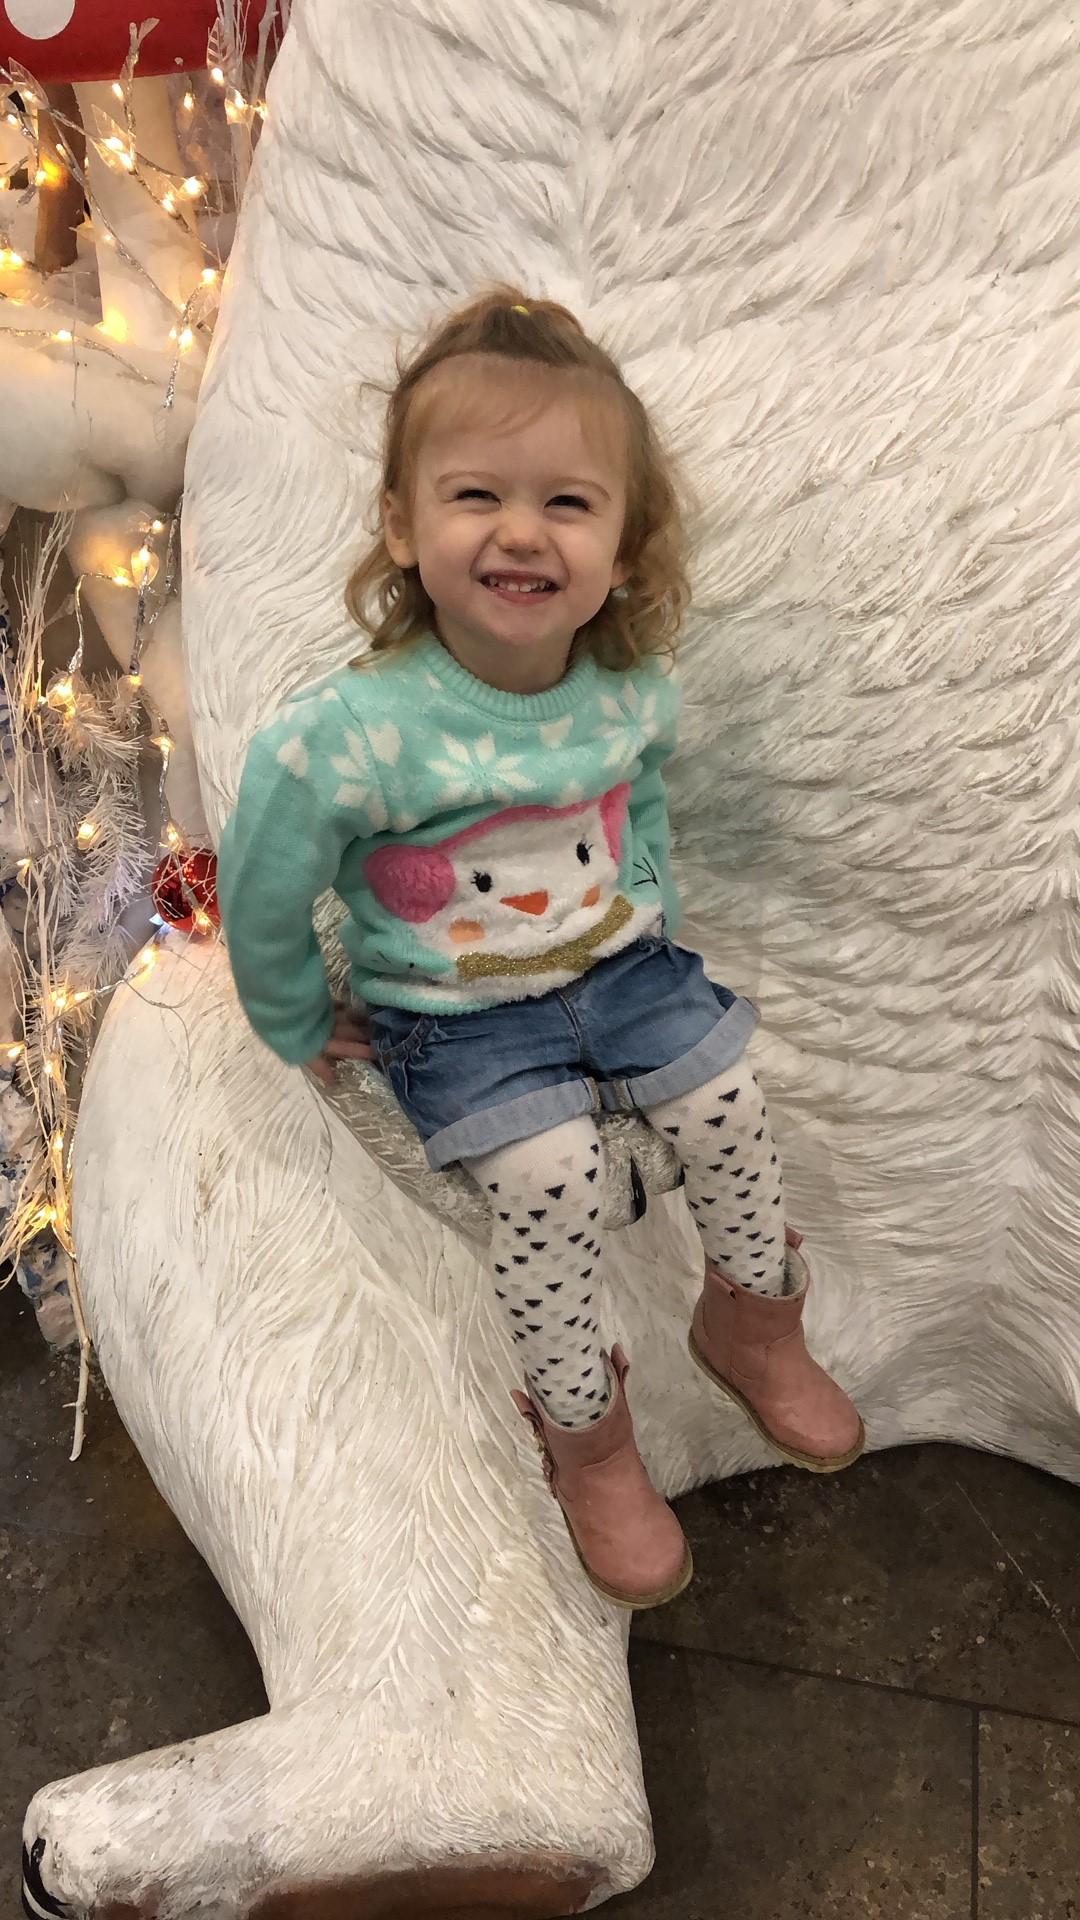 grinning little blonde girl